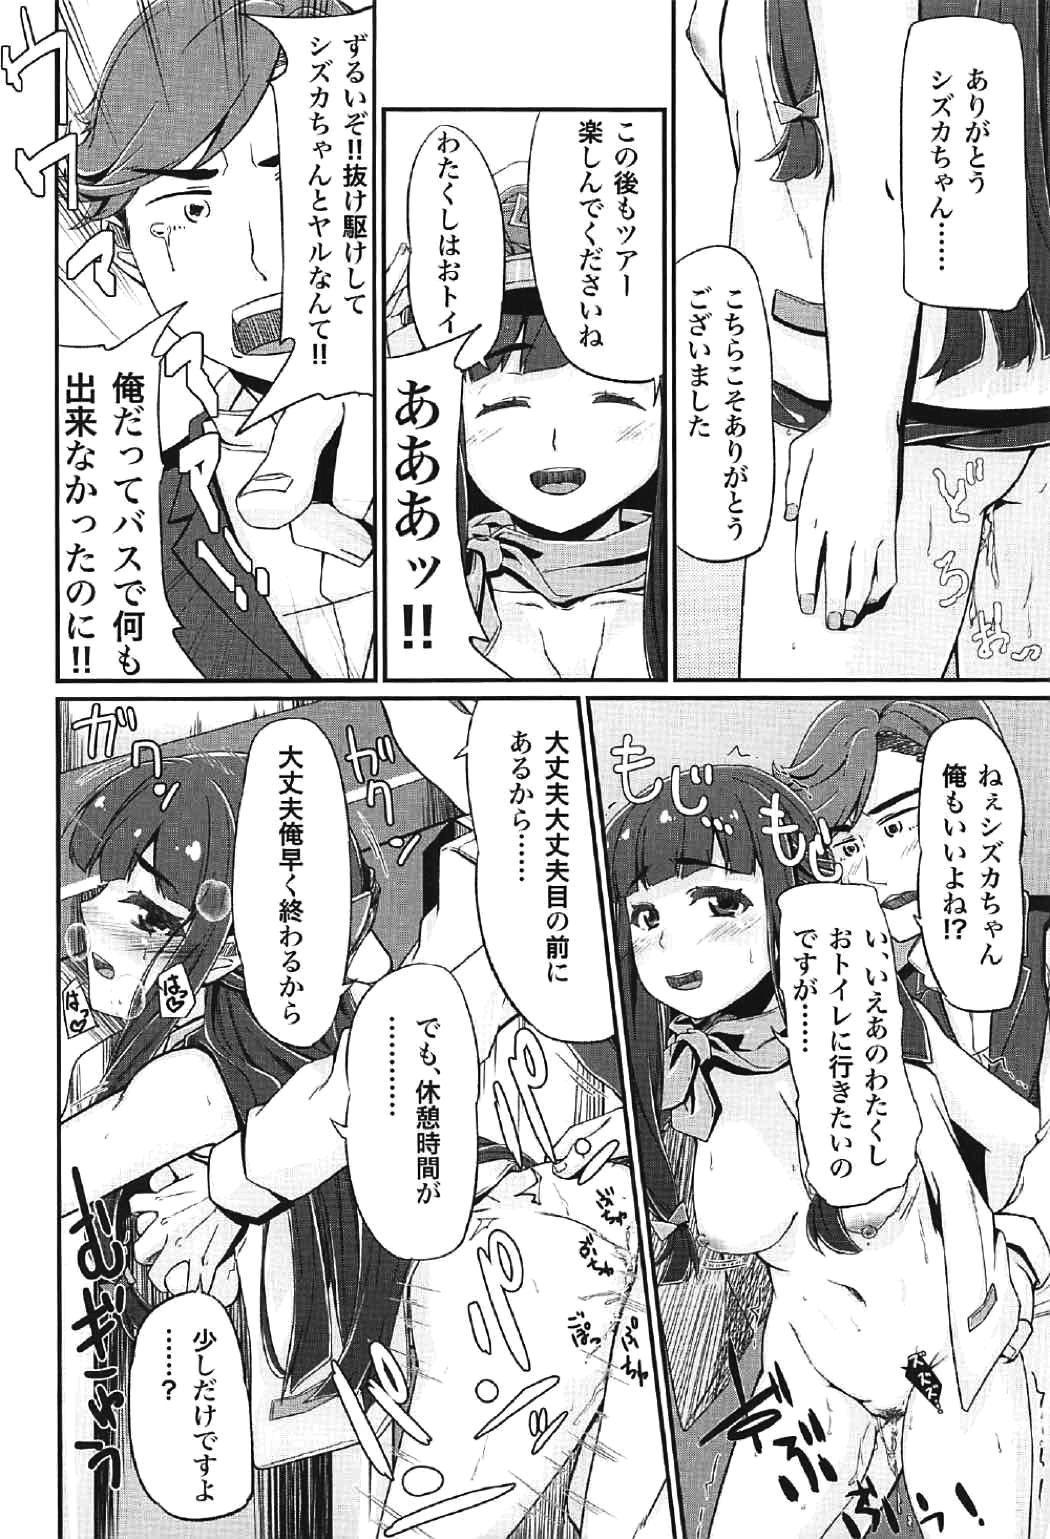 DC Ban Kuonji Shizuka to Iku Dokidoki Fan Bus Tour 10